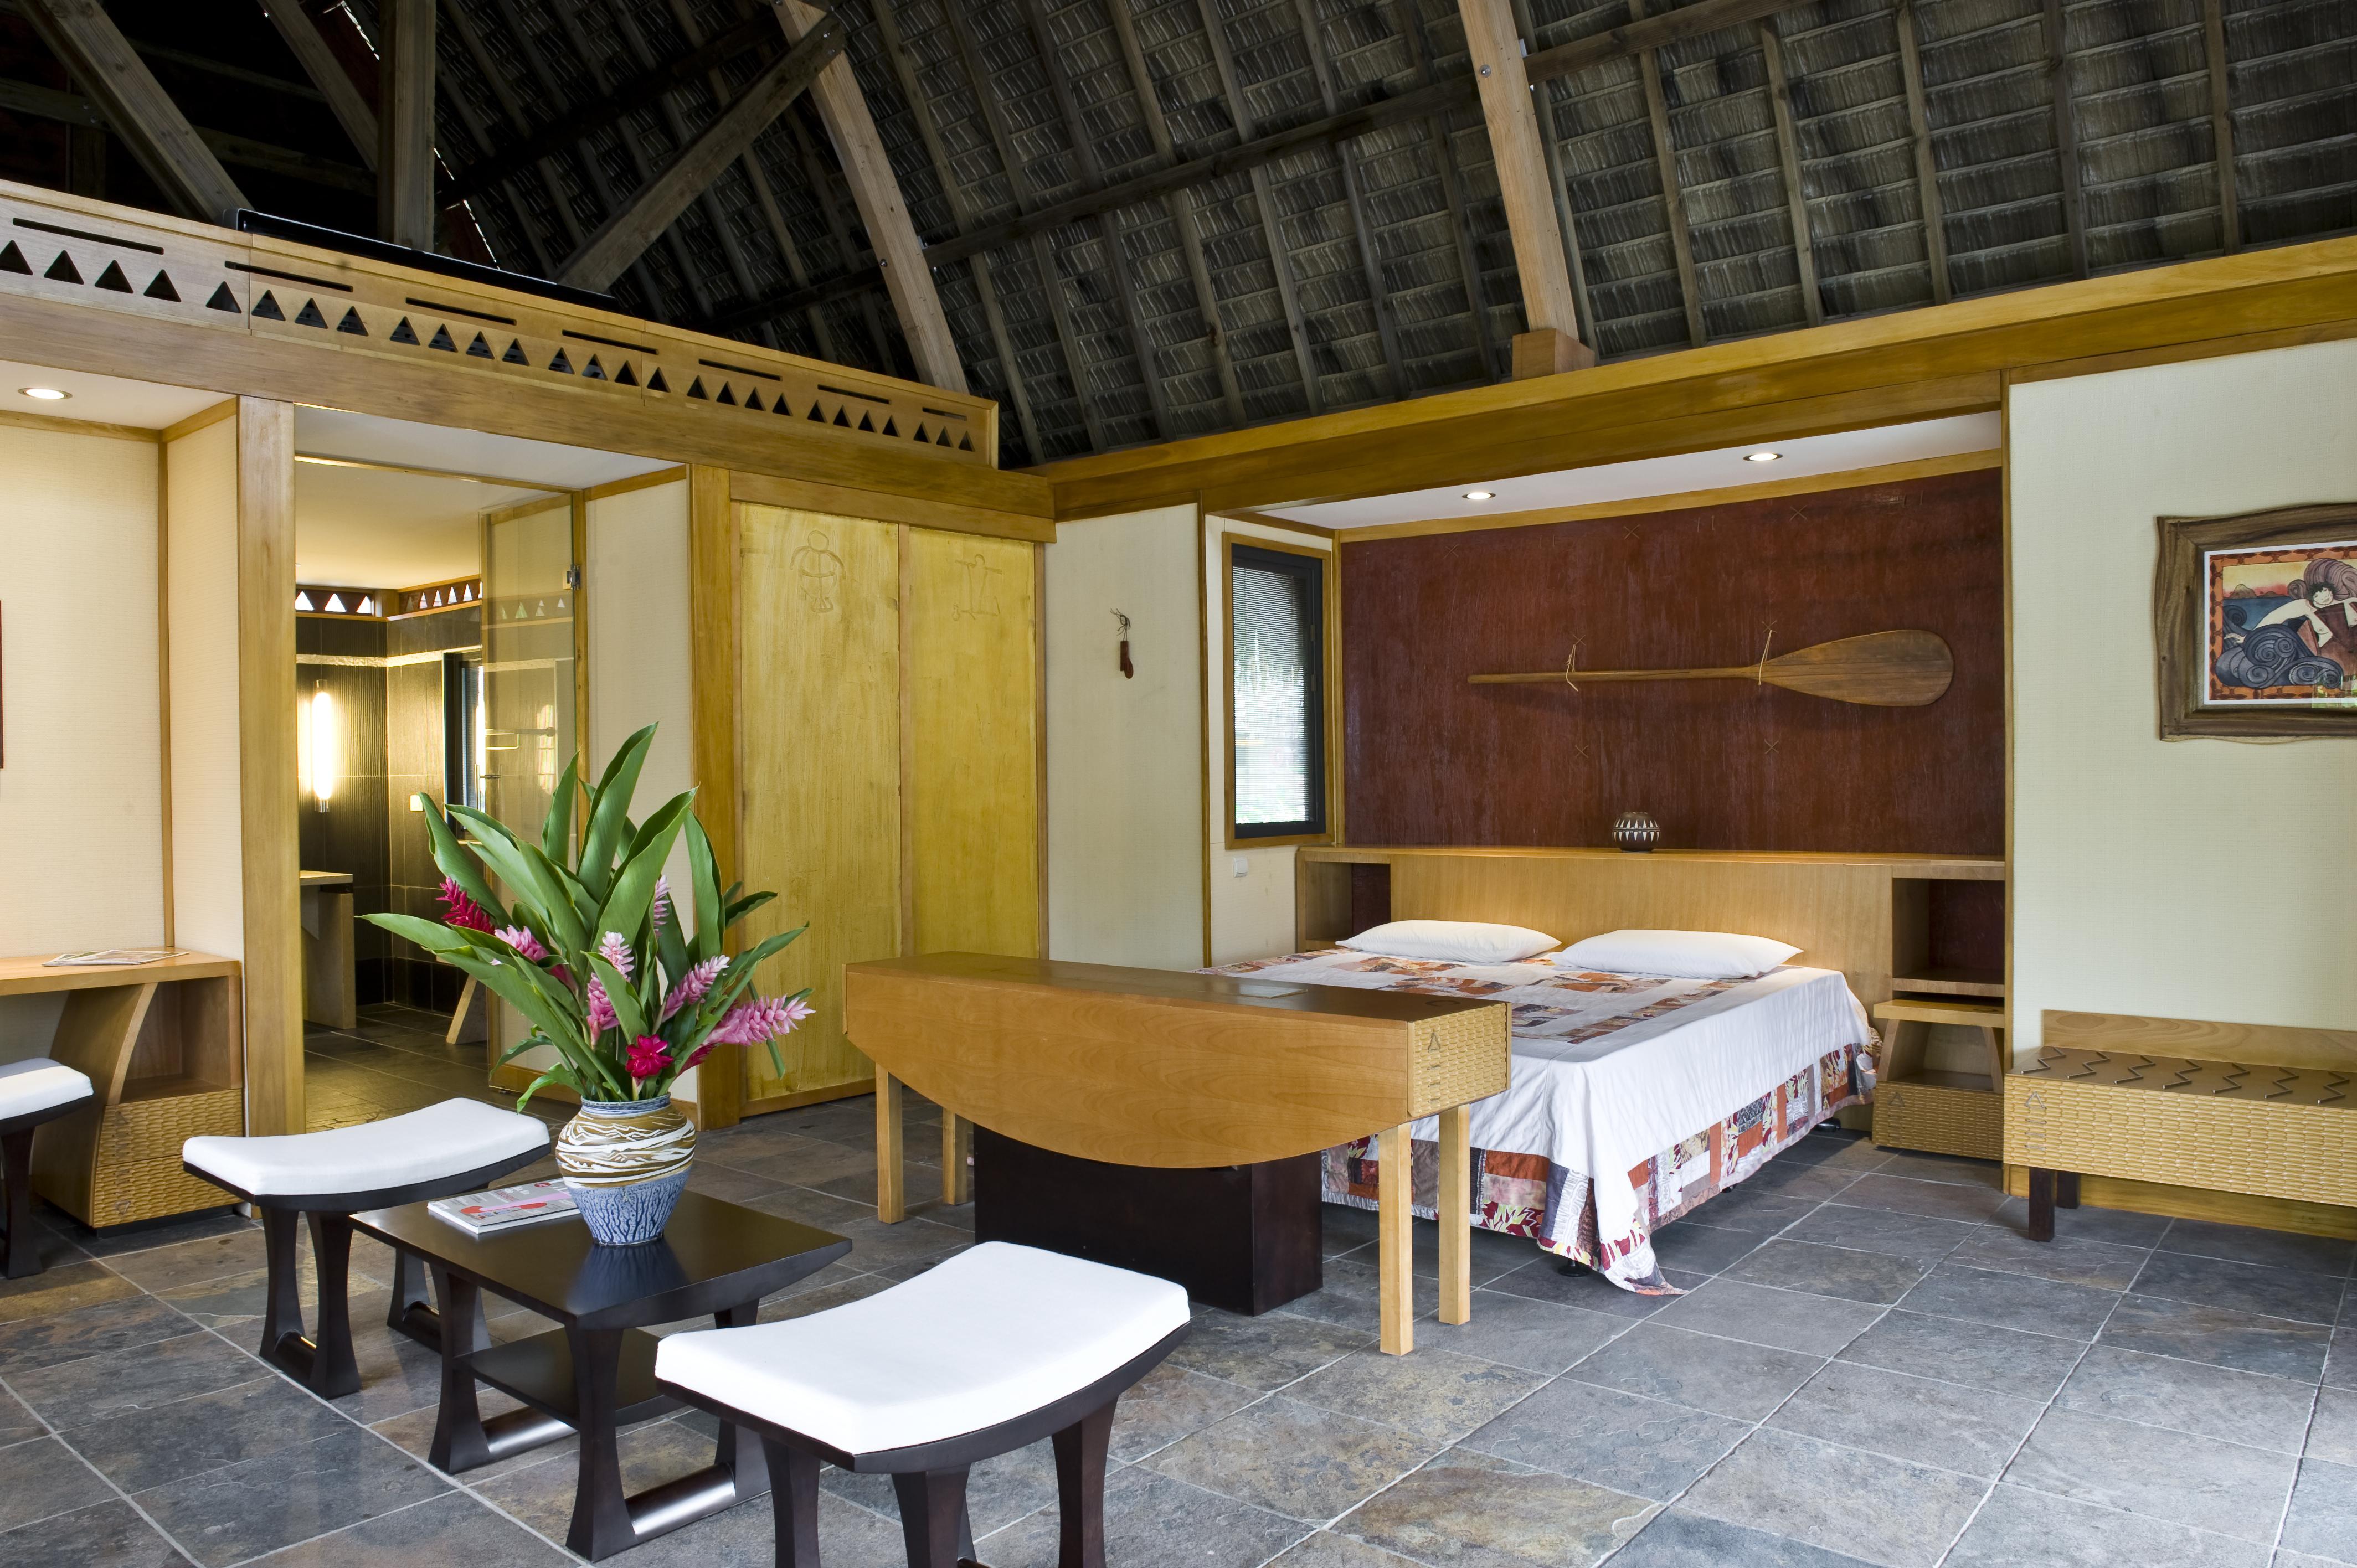 https://tahititourisme.com/wp-content/uploads/2017/11/HUH-Maitai-Room-Interior-2.gallery_image.1.jpg